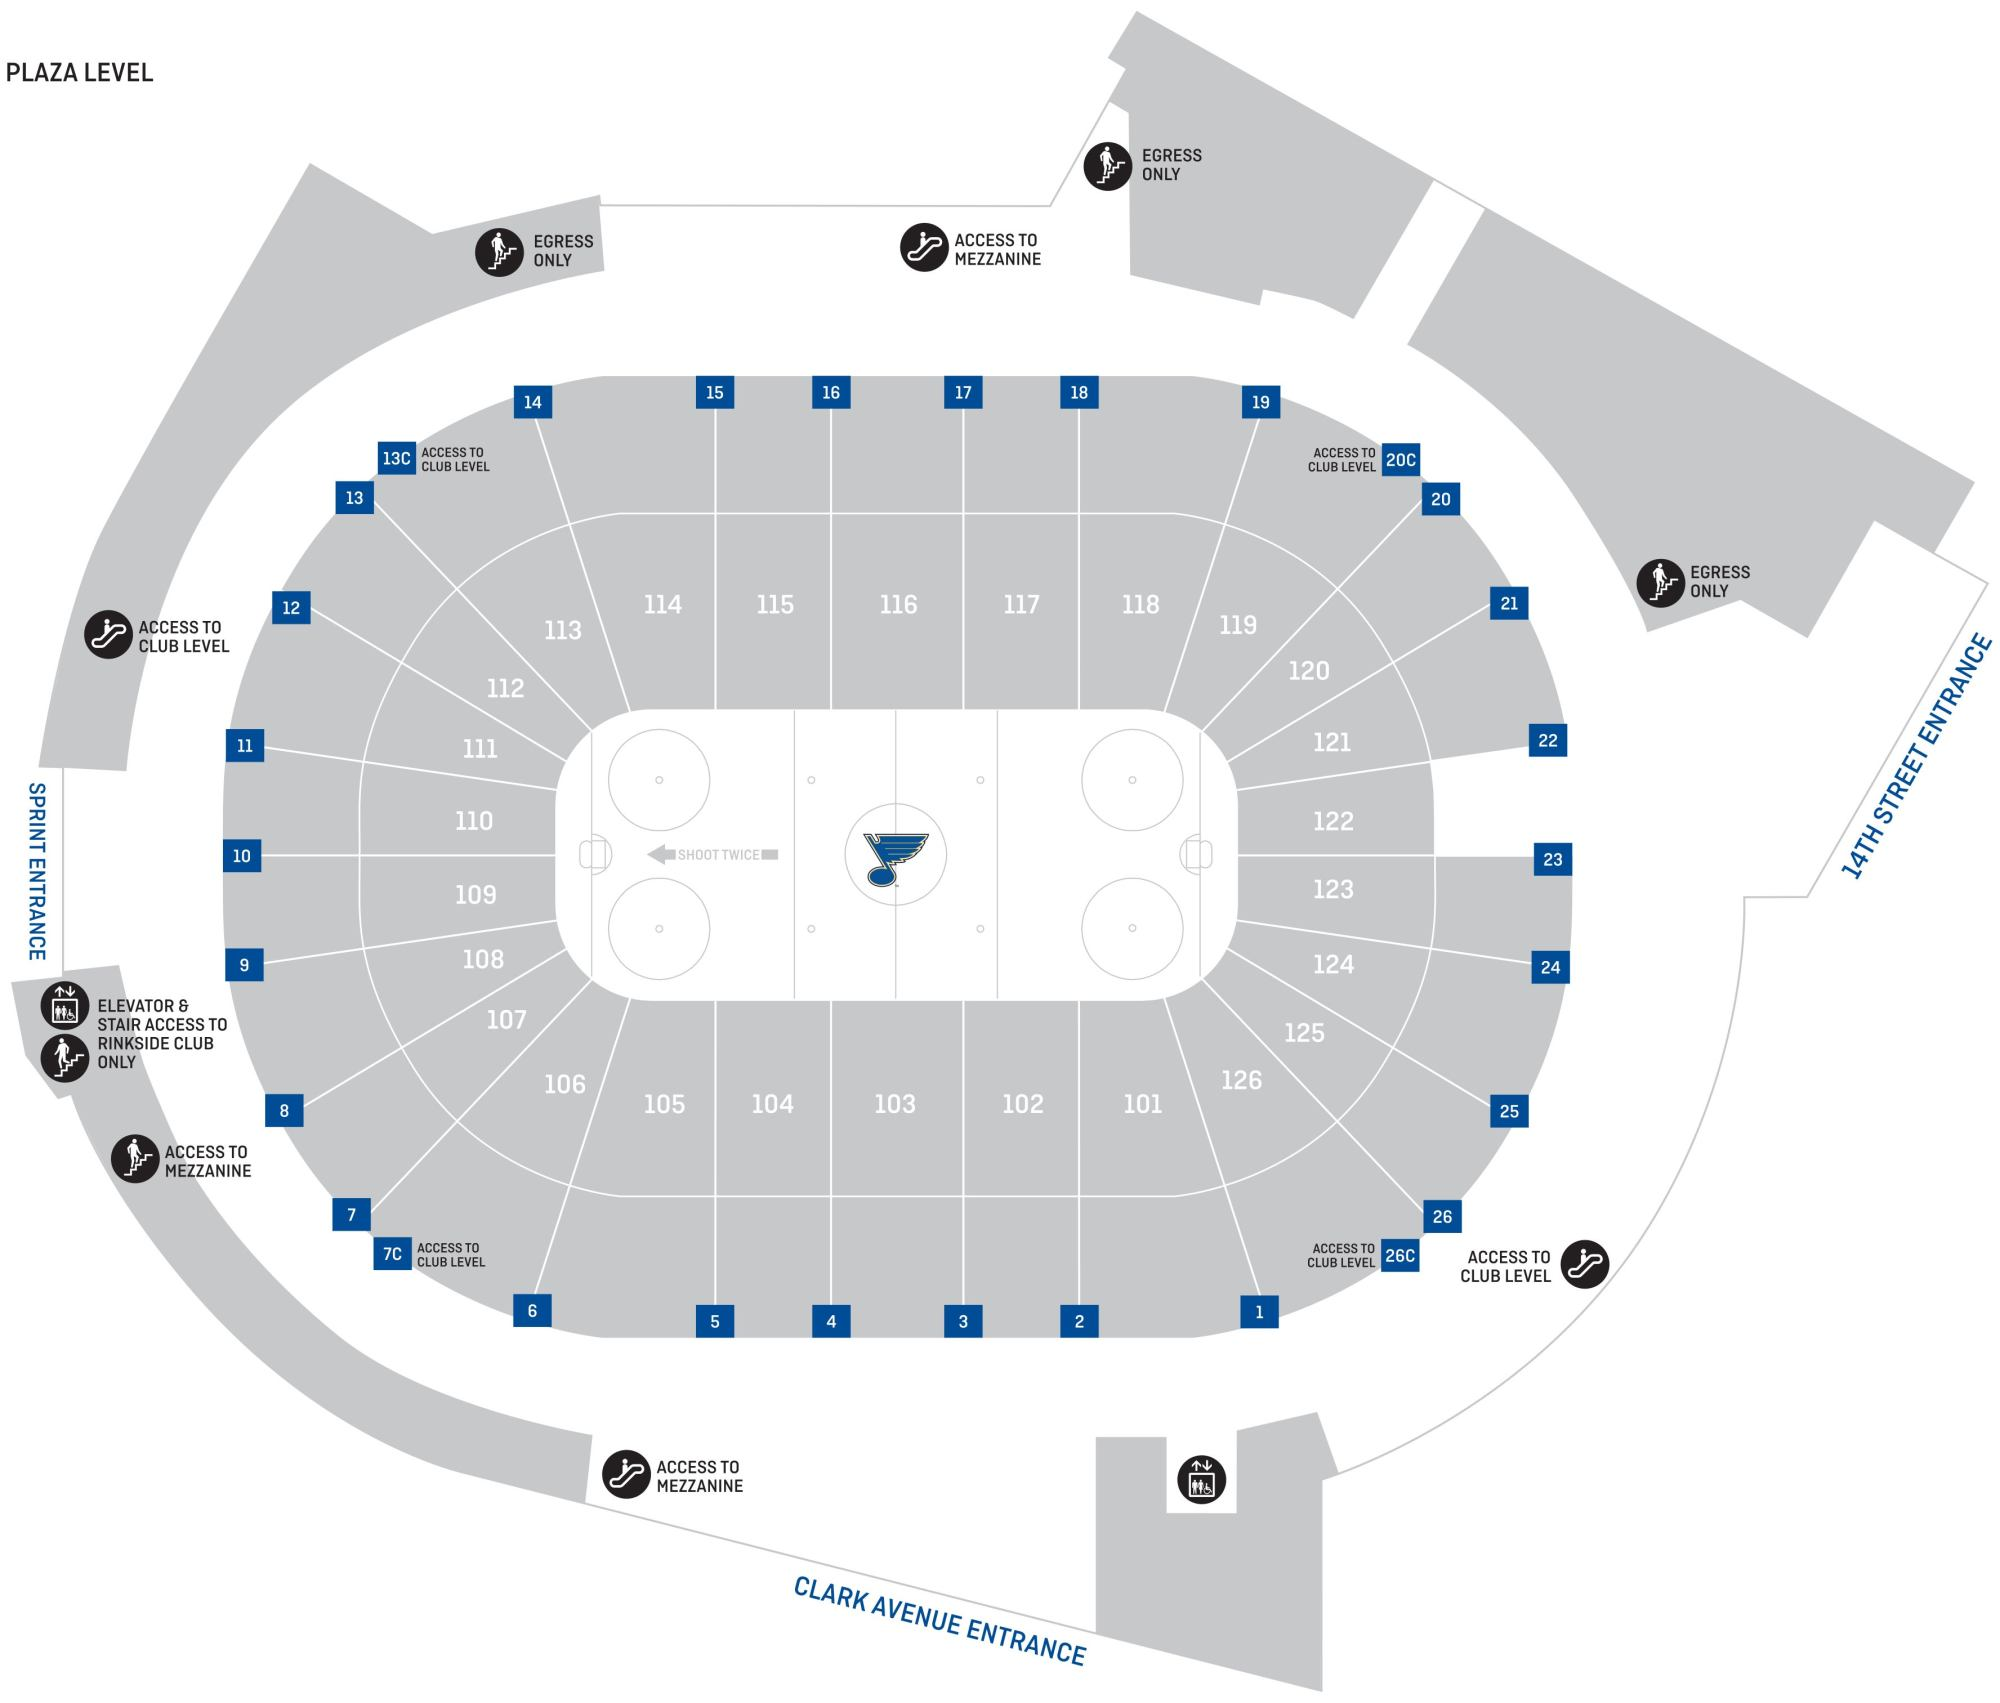 hight resolution of  plaza level portal seat map